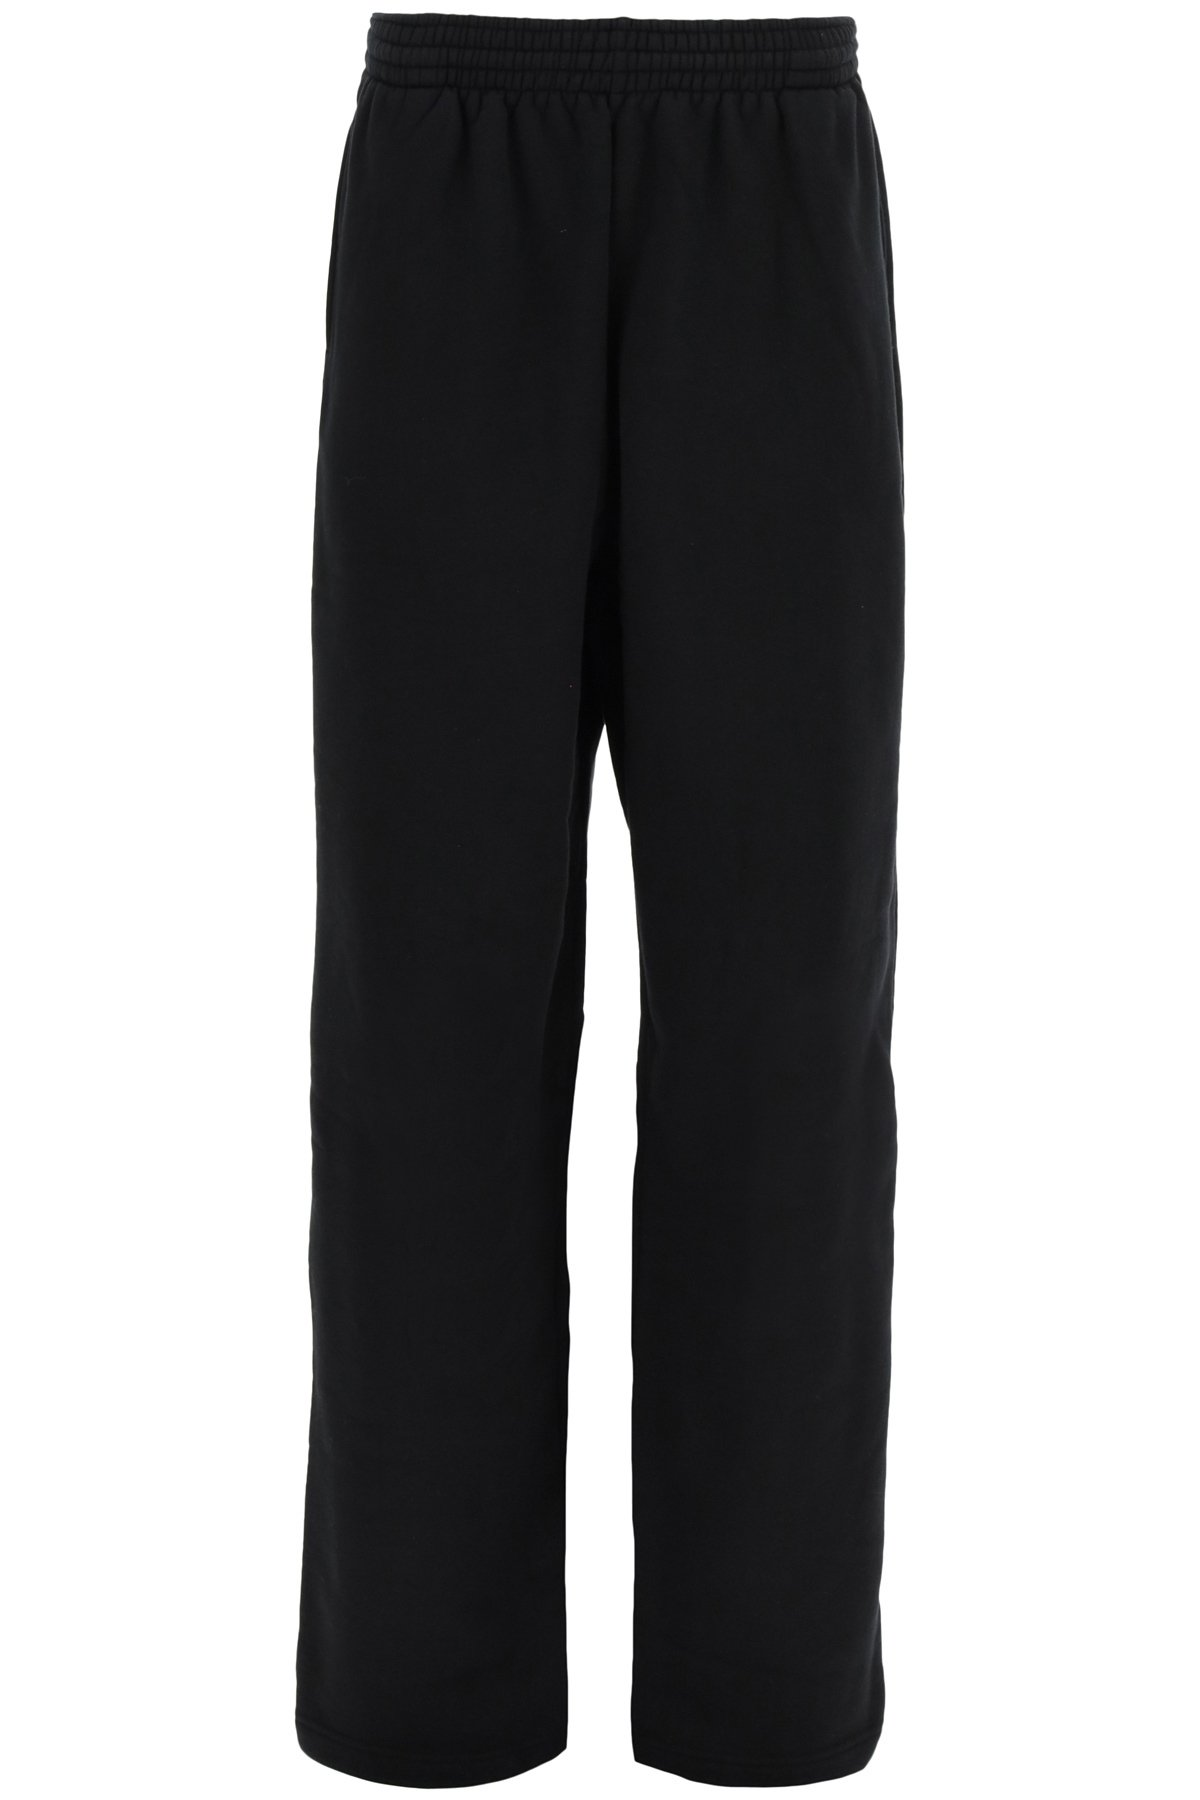 Balenciaga pantaloni baggy in felpa pesante